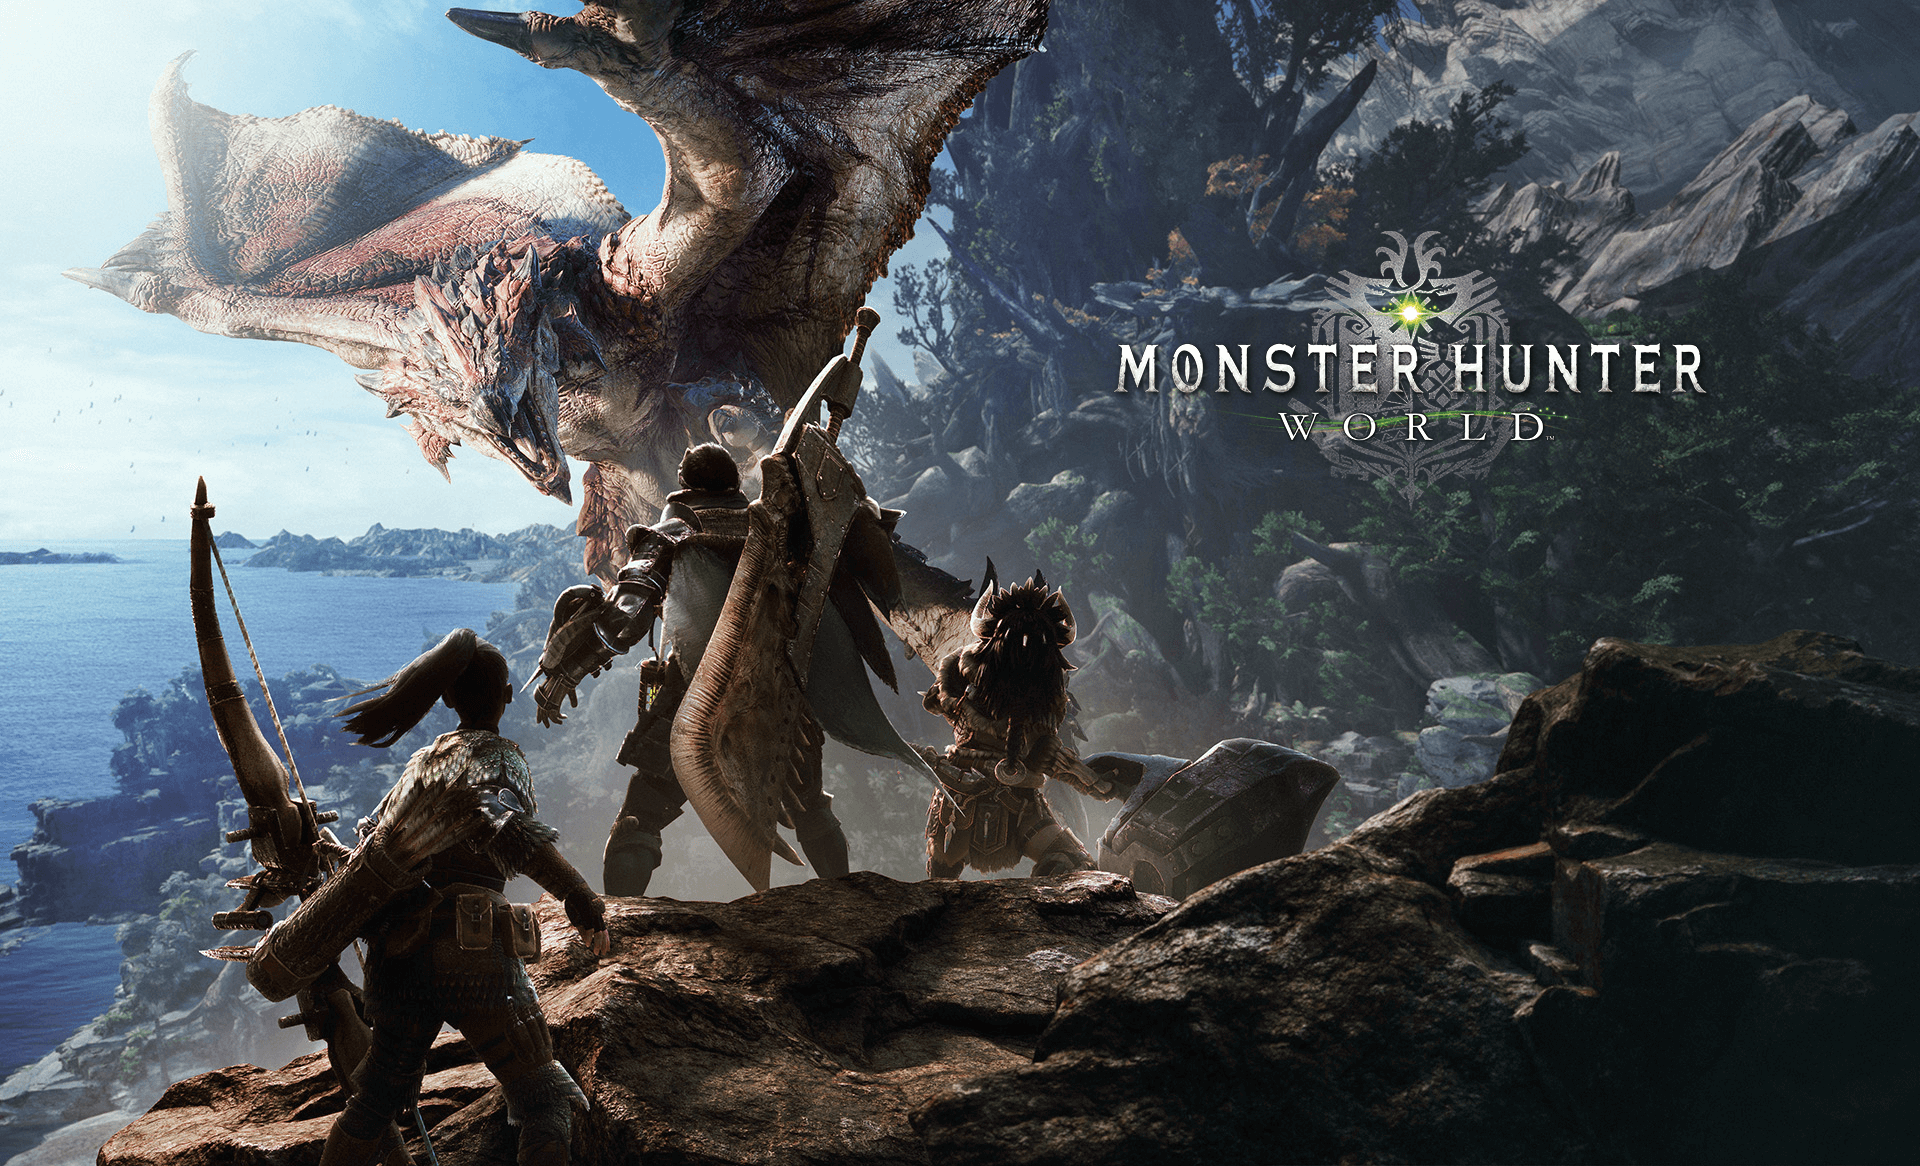 Si aprendes a bajar el ping en Monster Hunter World serás un gran cazador